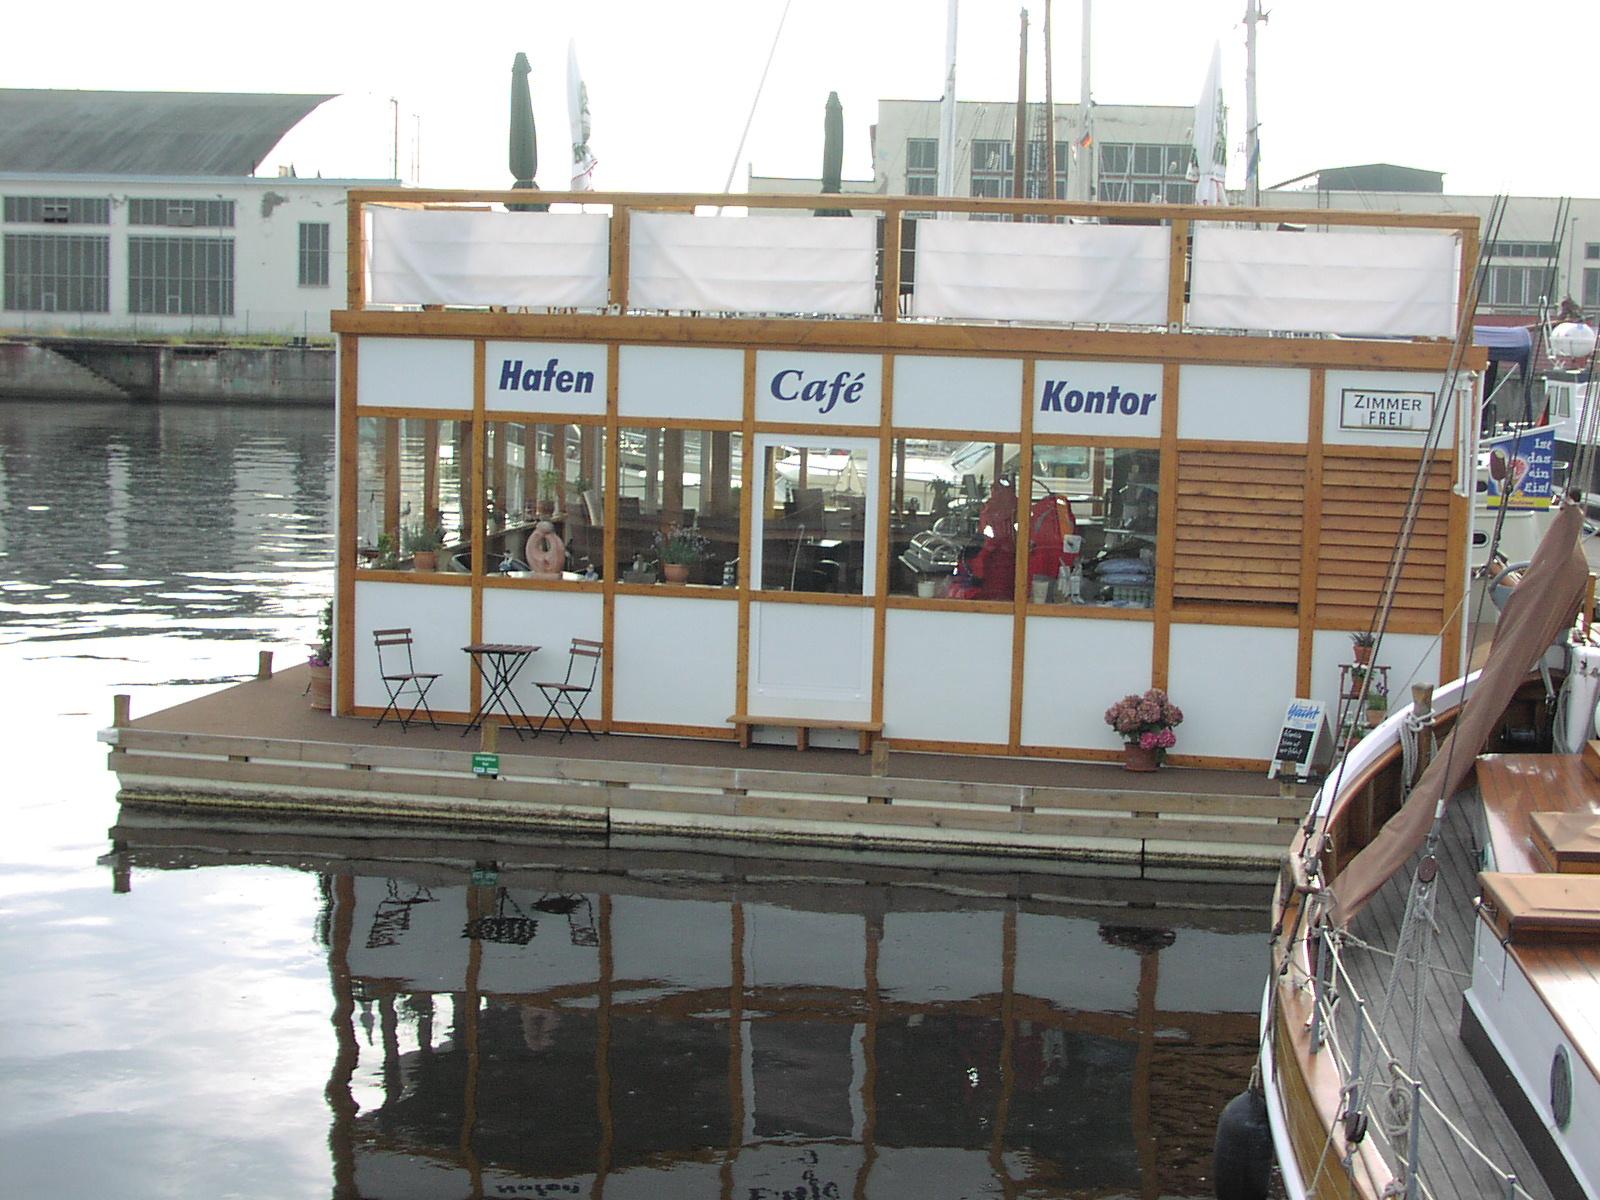 35 httpwww.westhafen.netgastronomie-beherbergungcafe.JPG